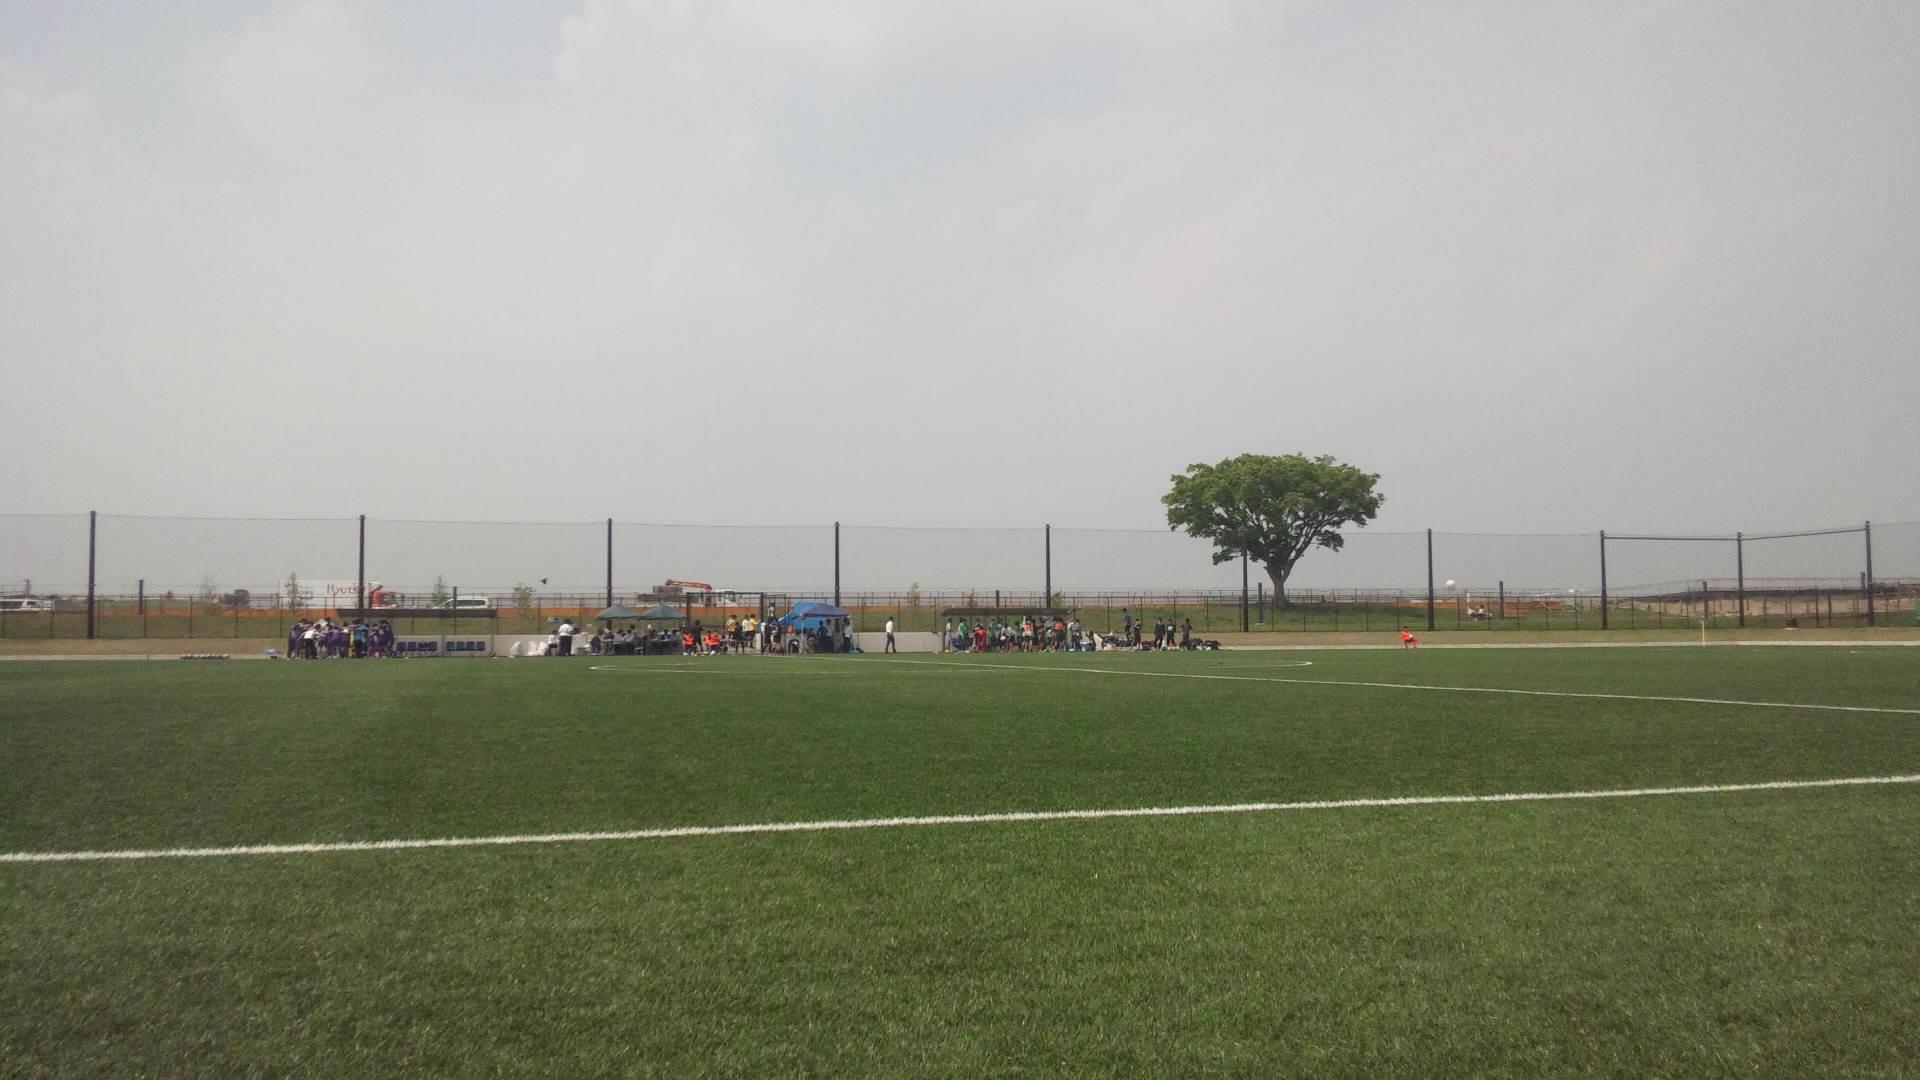 綾瀬スポーツ公園第一多目的広場2011年5月18日